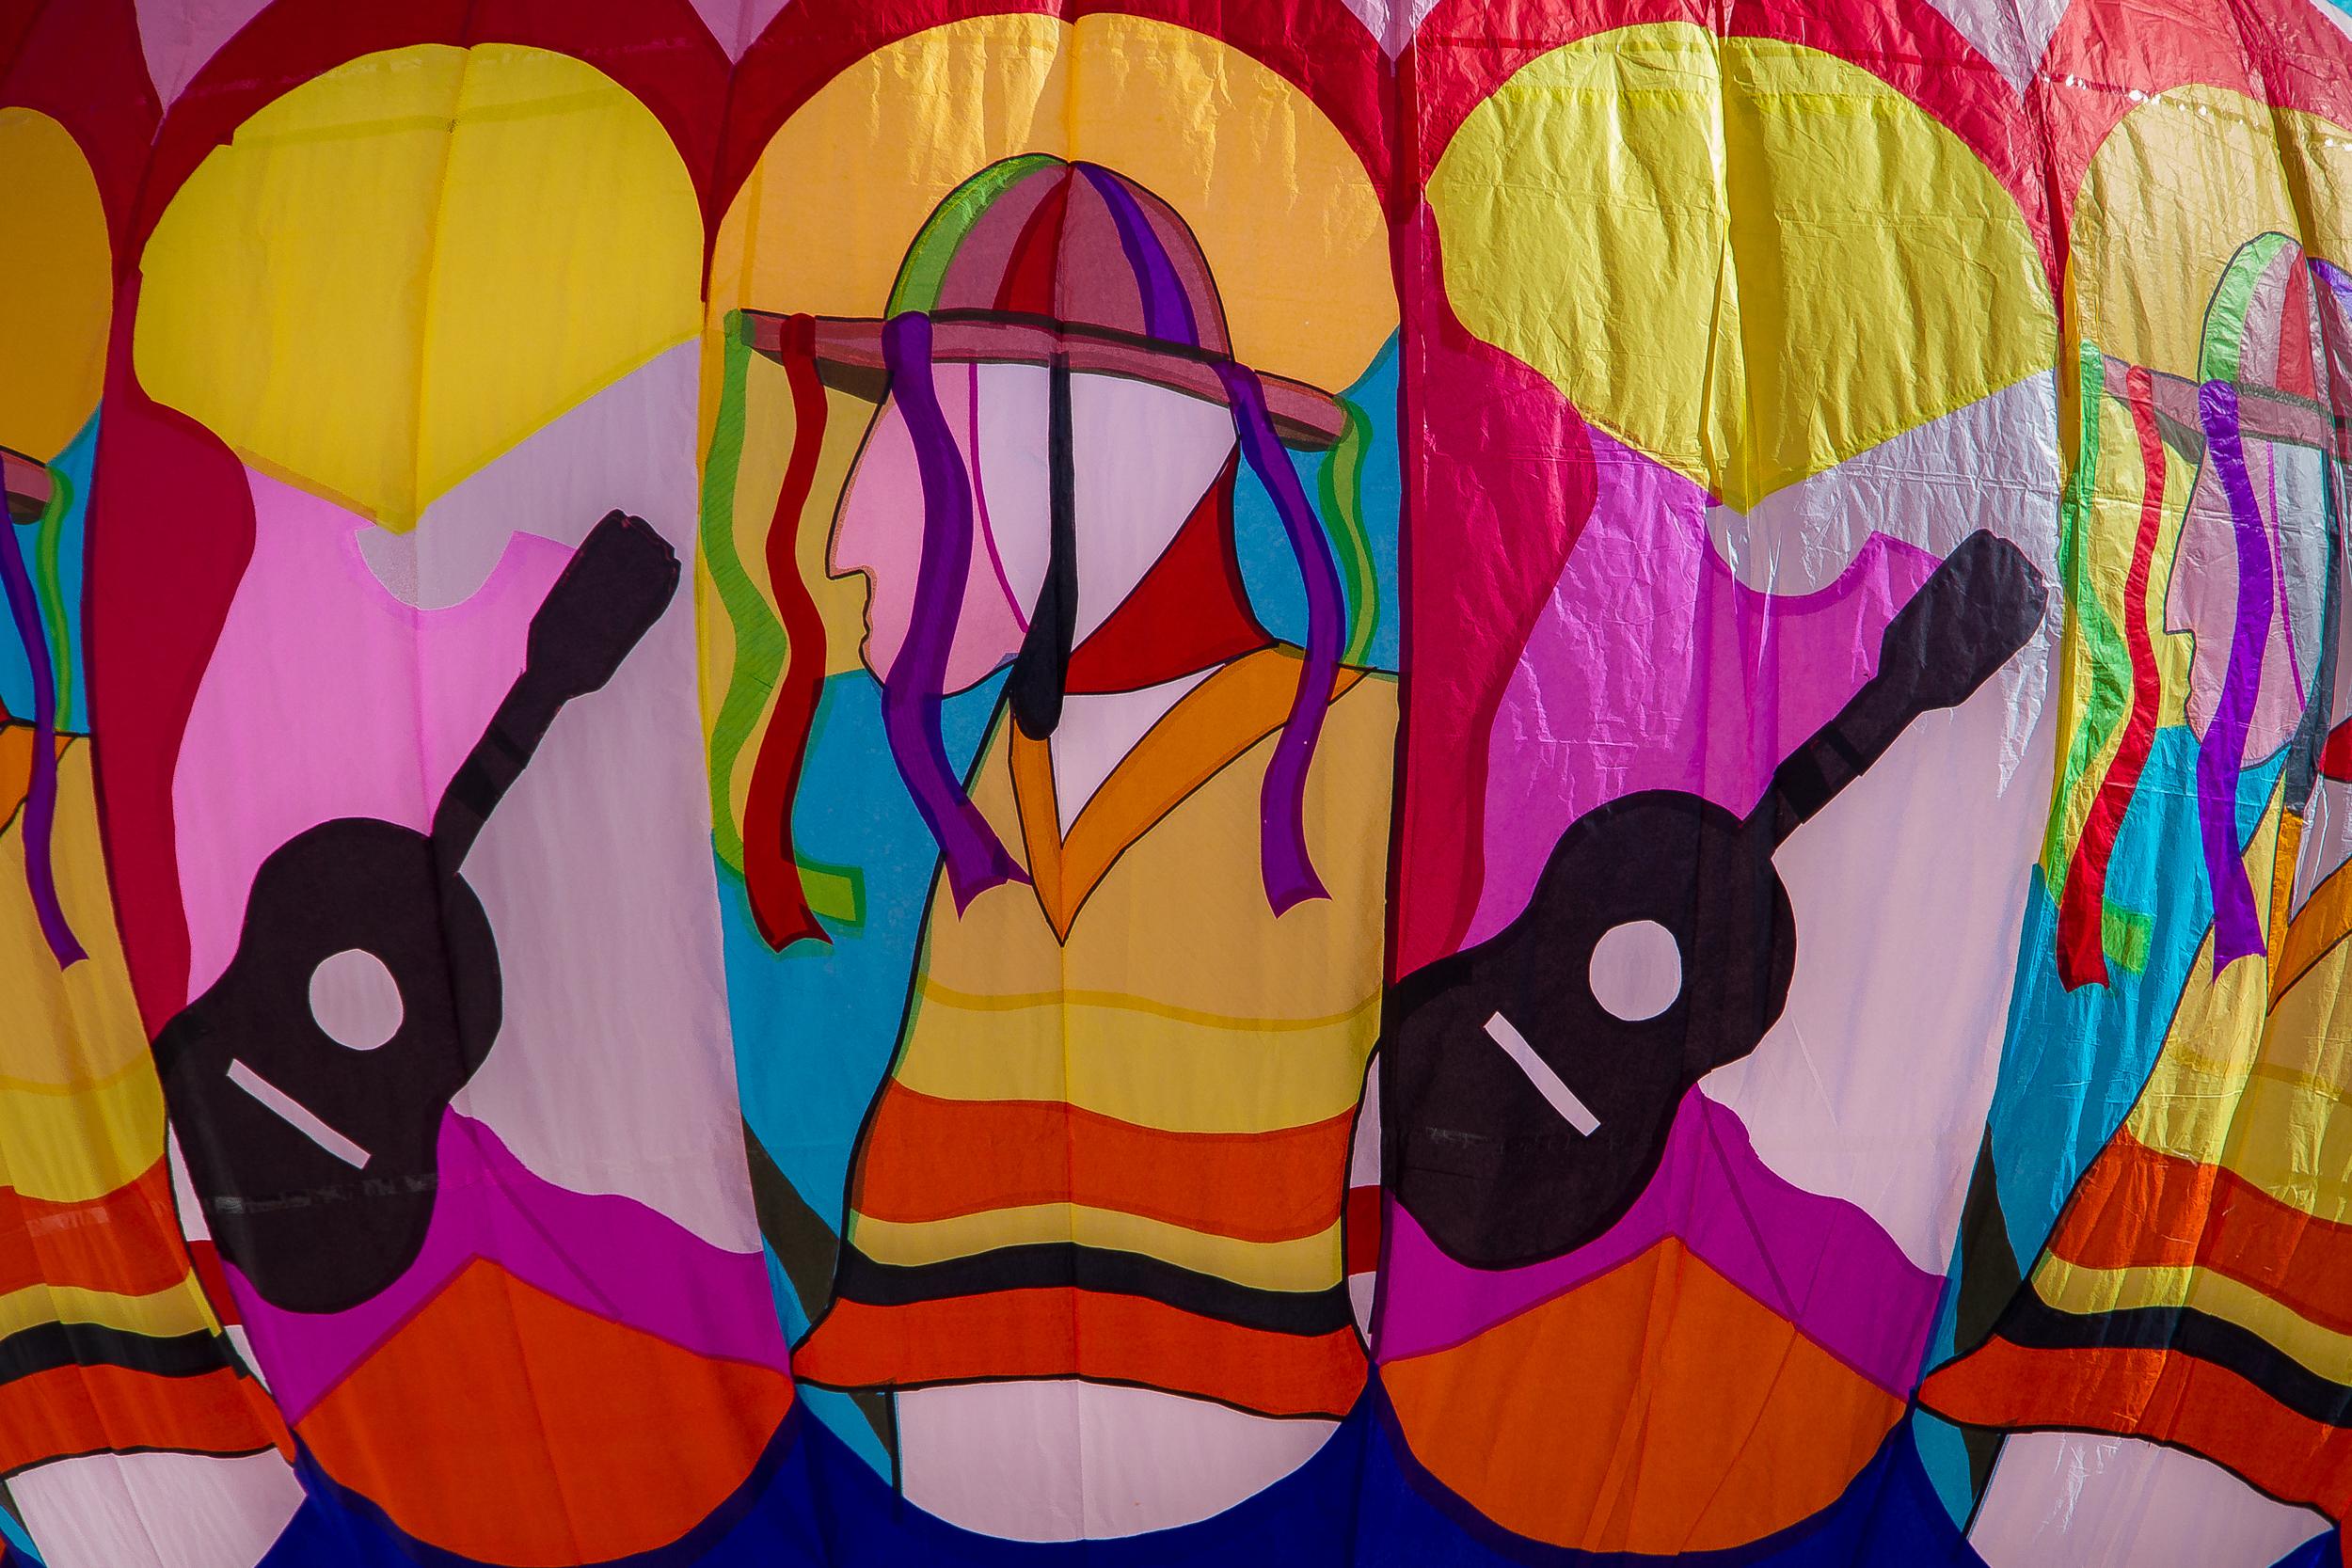 La Danza de los Viejitos (The Dance of the Little Old Men)    CantoyaFest: Paracho, Michoacán, Mexico — Saturday, July 19, 2014